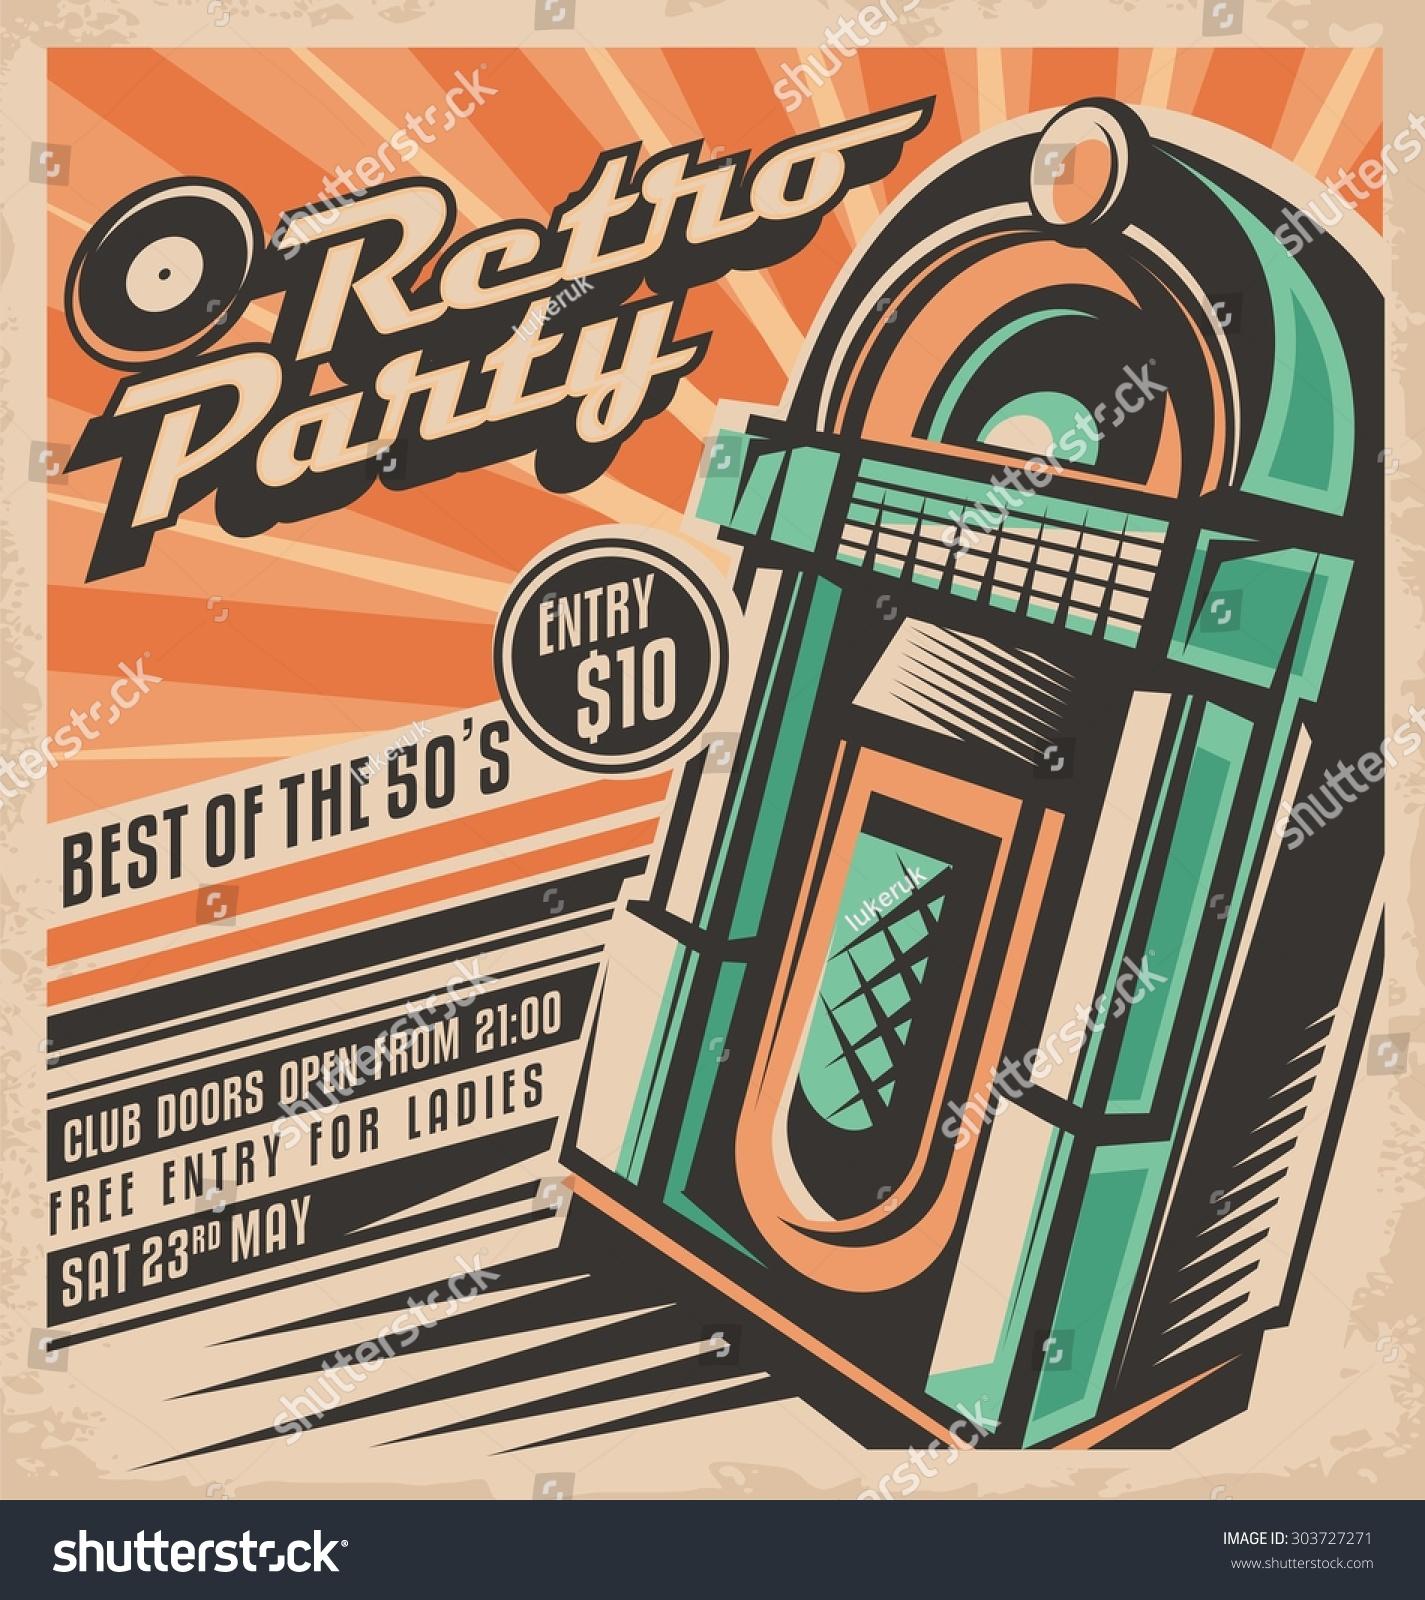 Retro Party Invitation Design Template Vintage Stock Vector 303727271 - Shutterstock